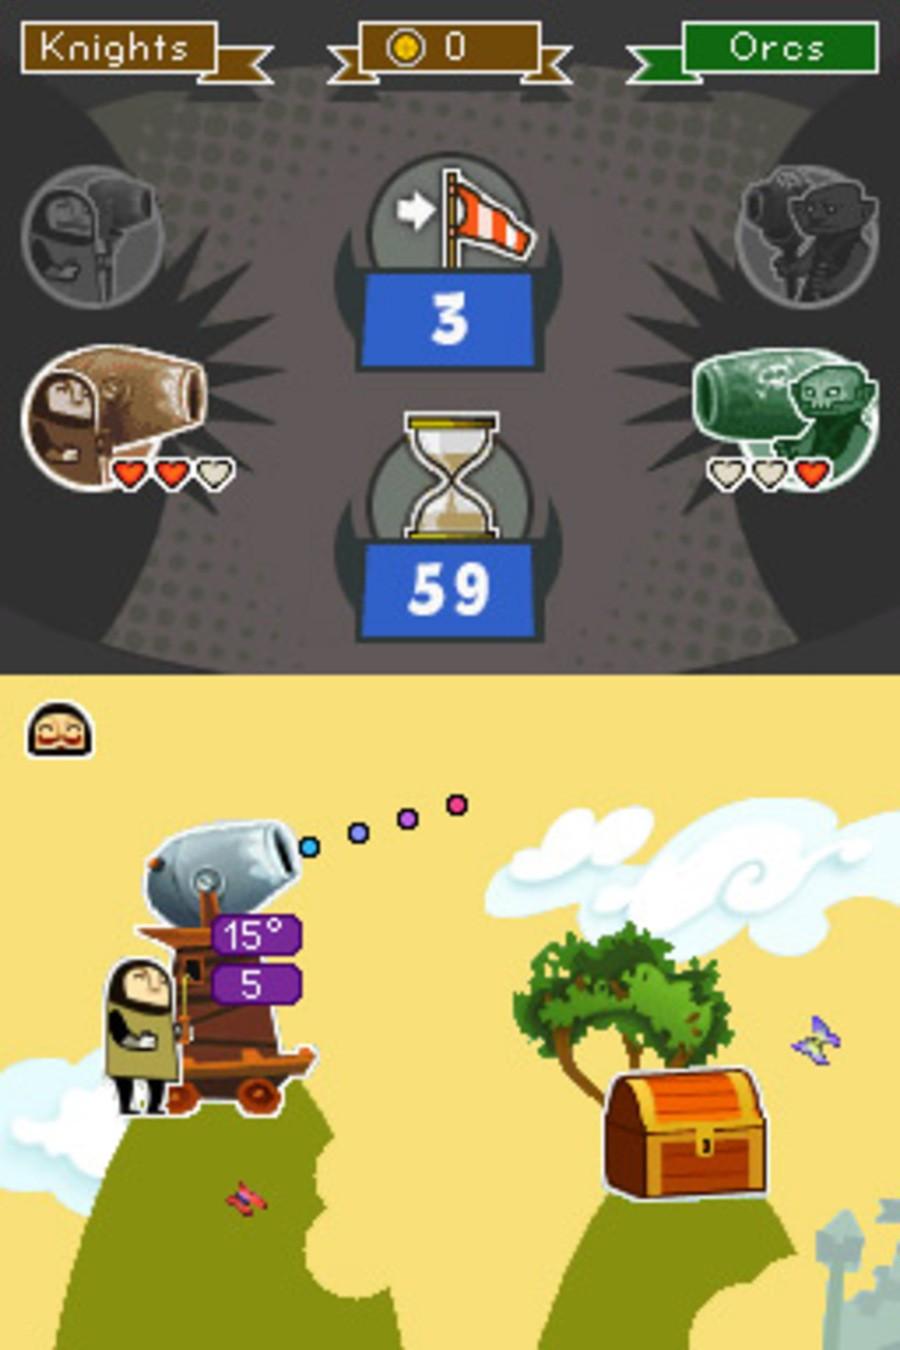 Artillery: Knights vs. Orcs Screenshot